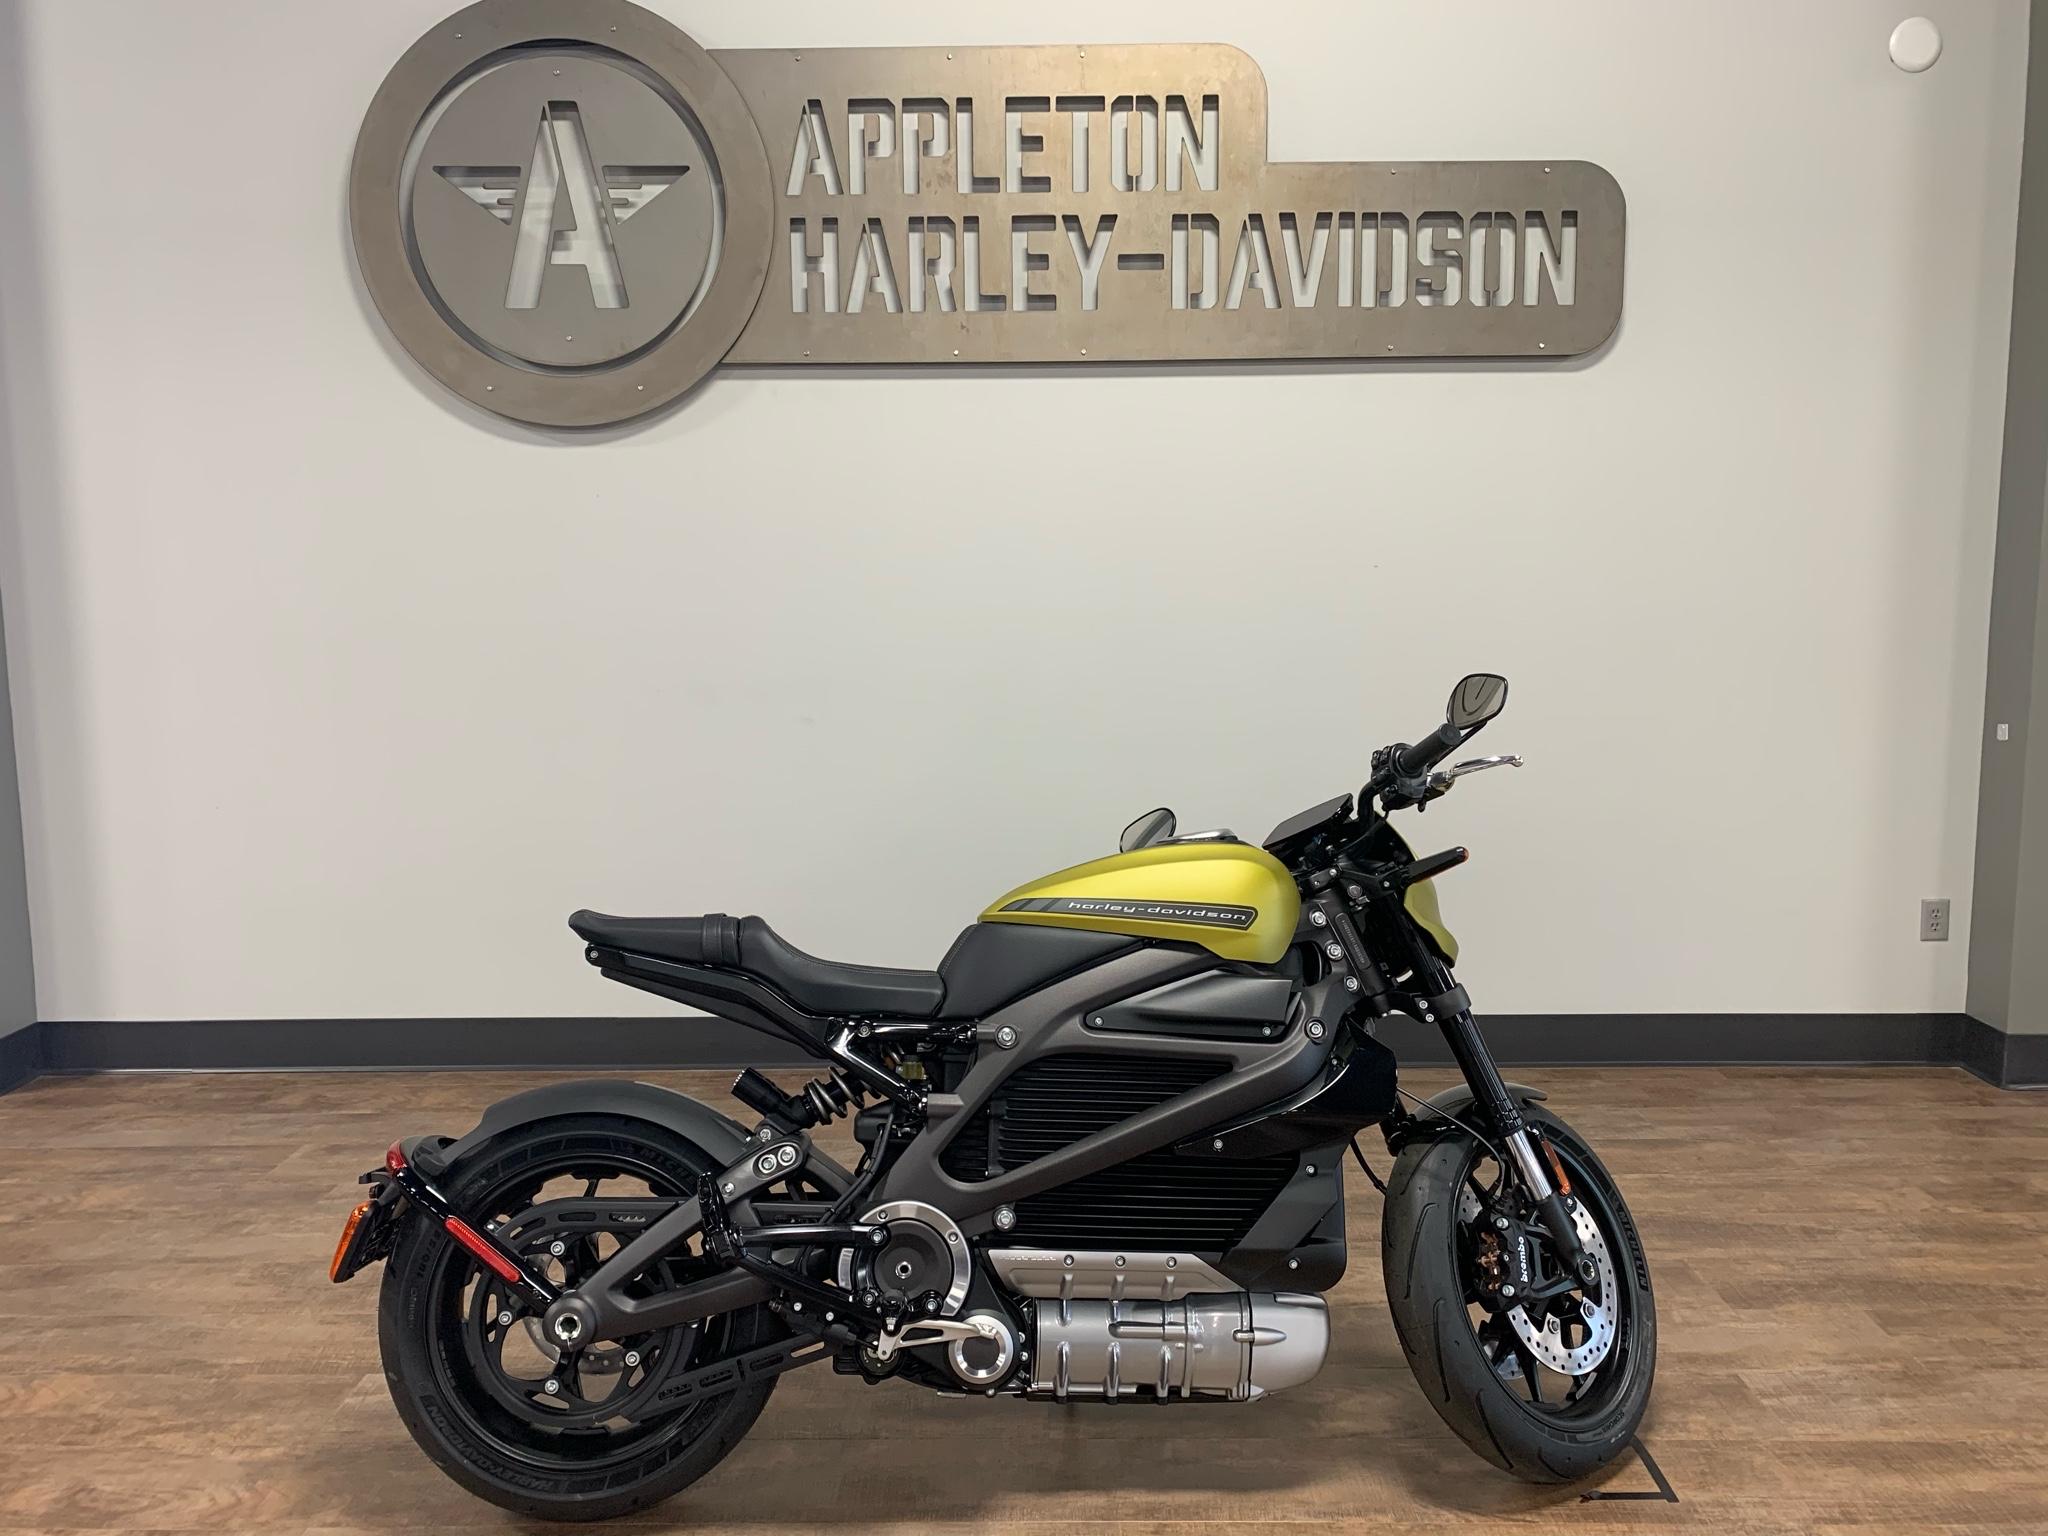 2020 Harley-Davidson Livewire [1]